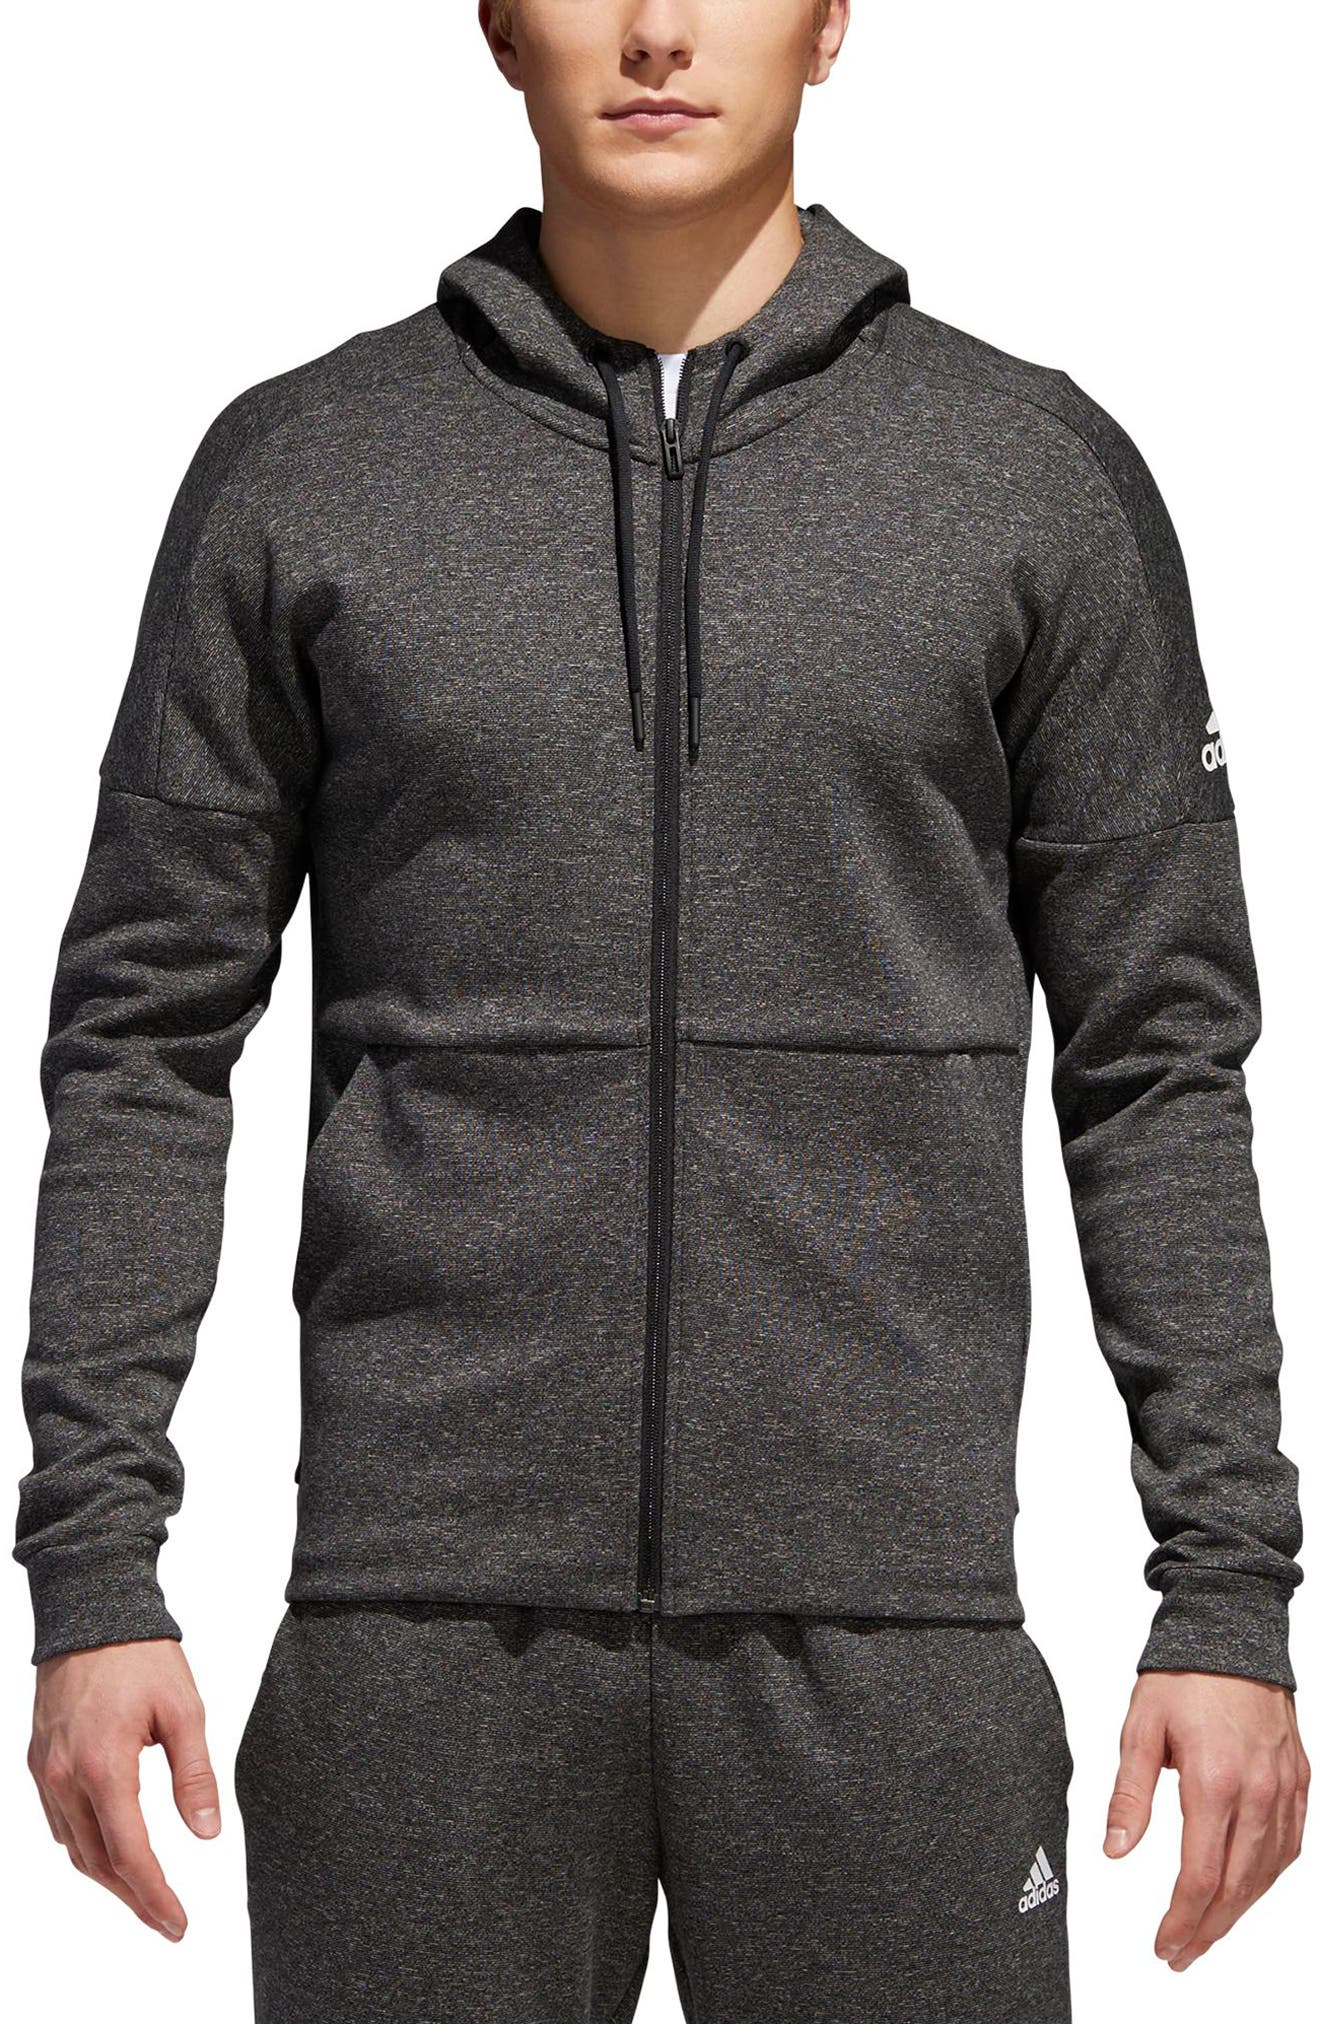 Men's Adidas Clothing   Nordstrom